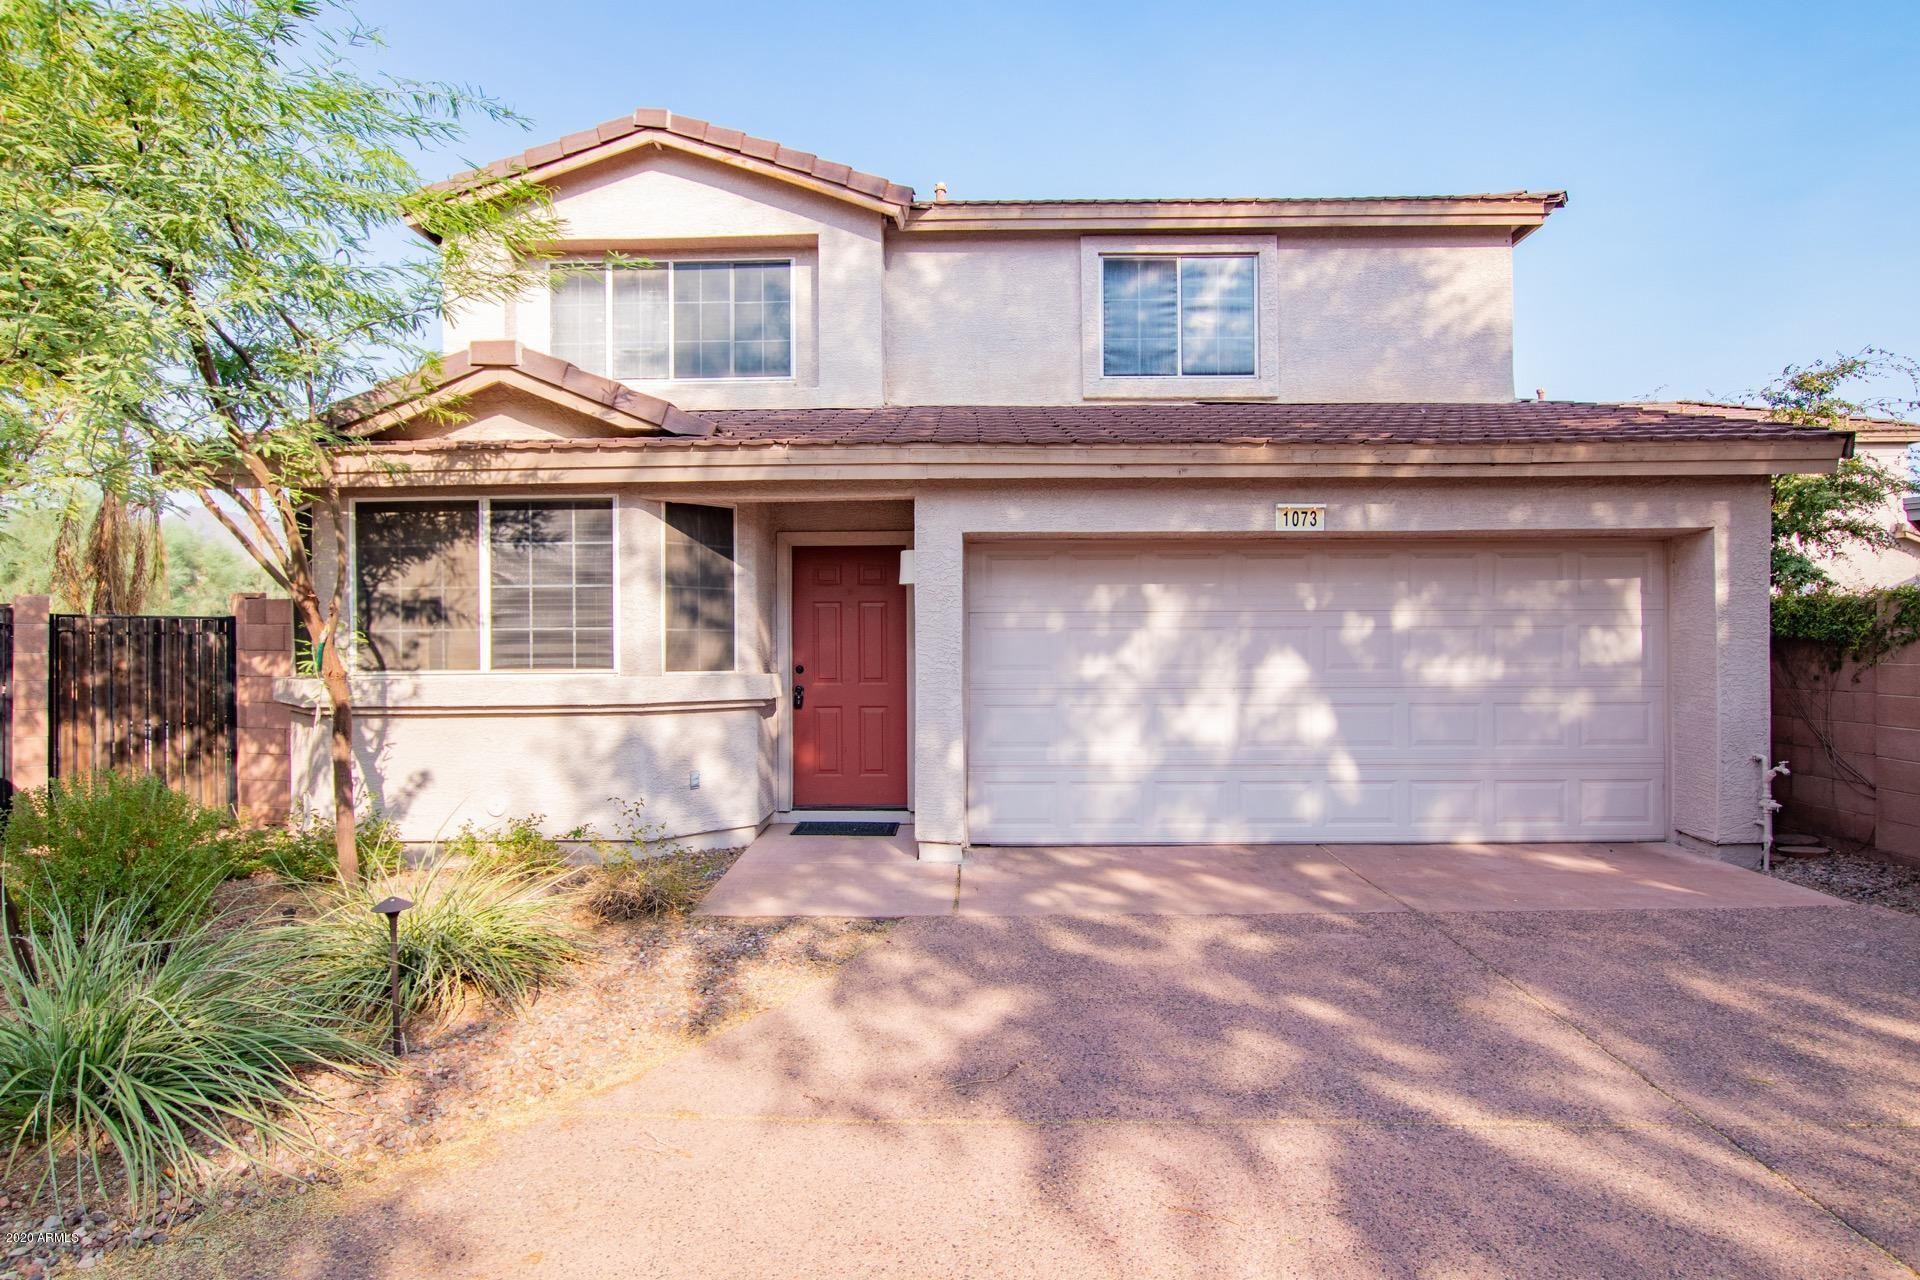 15550 N FRANK LLOYD WRIGHT Boulevard #1073, Scottsdale, AZ 85260 - MLS#: 6133029